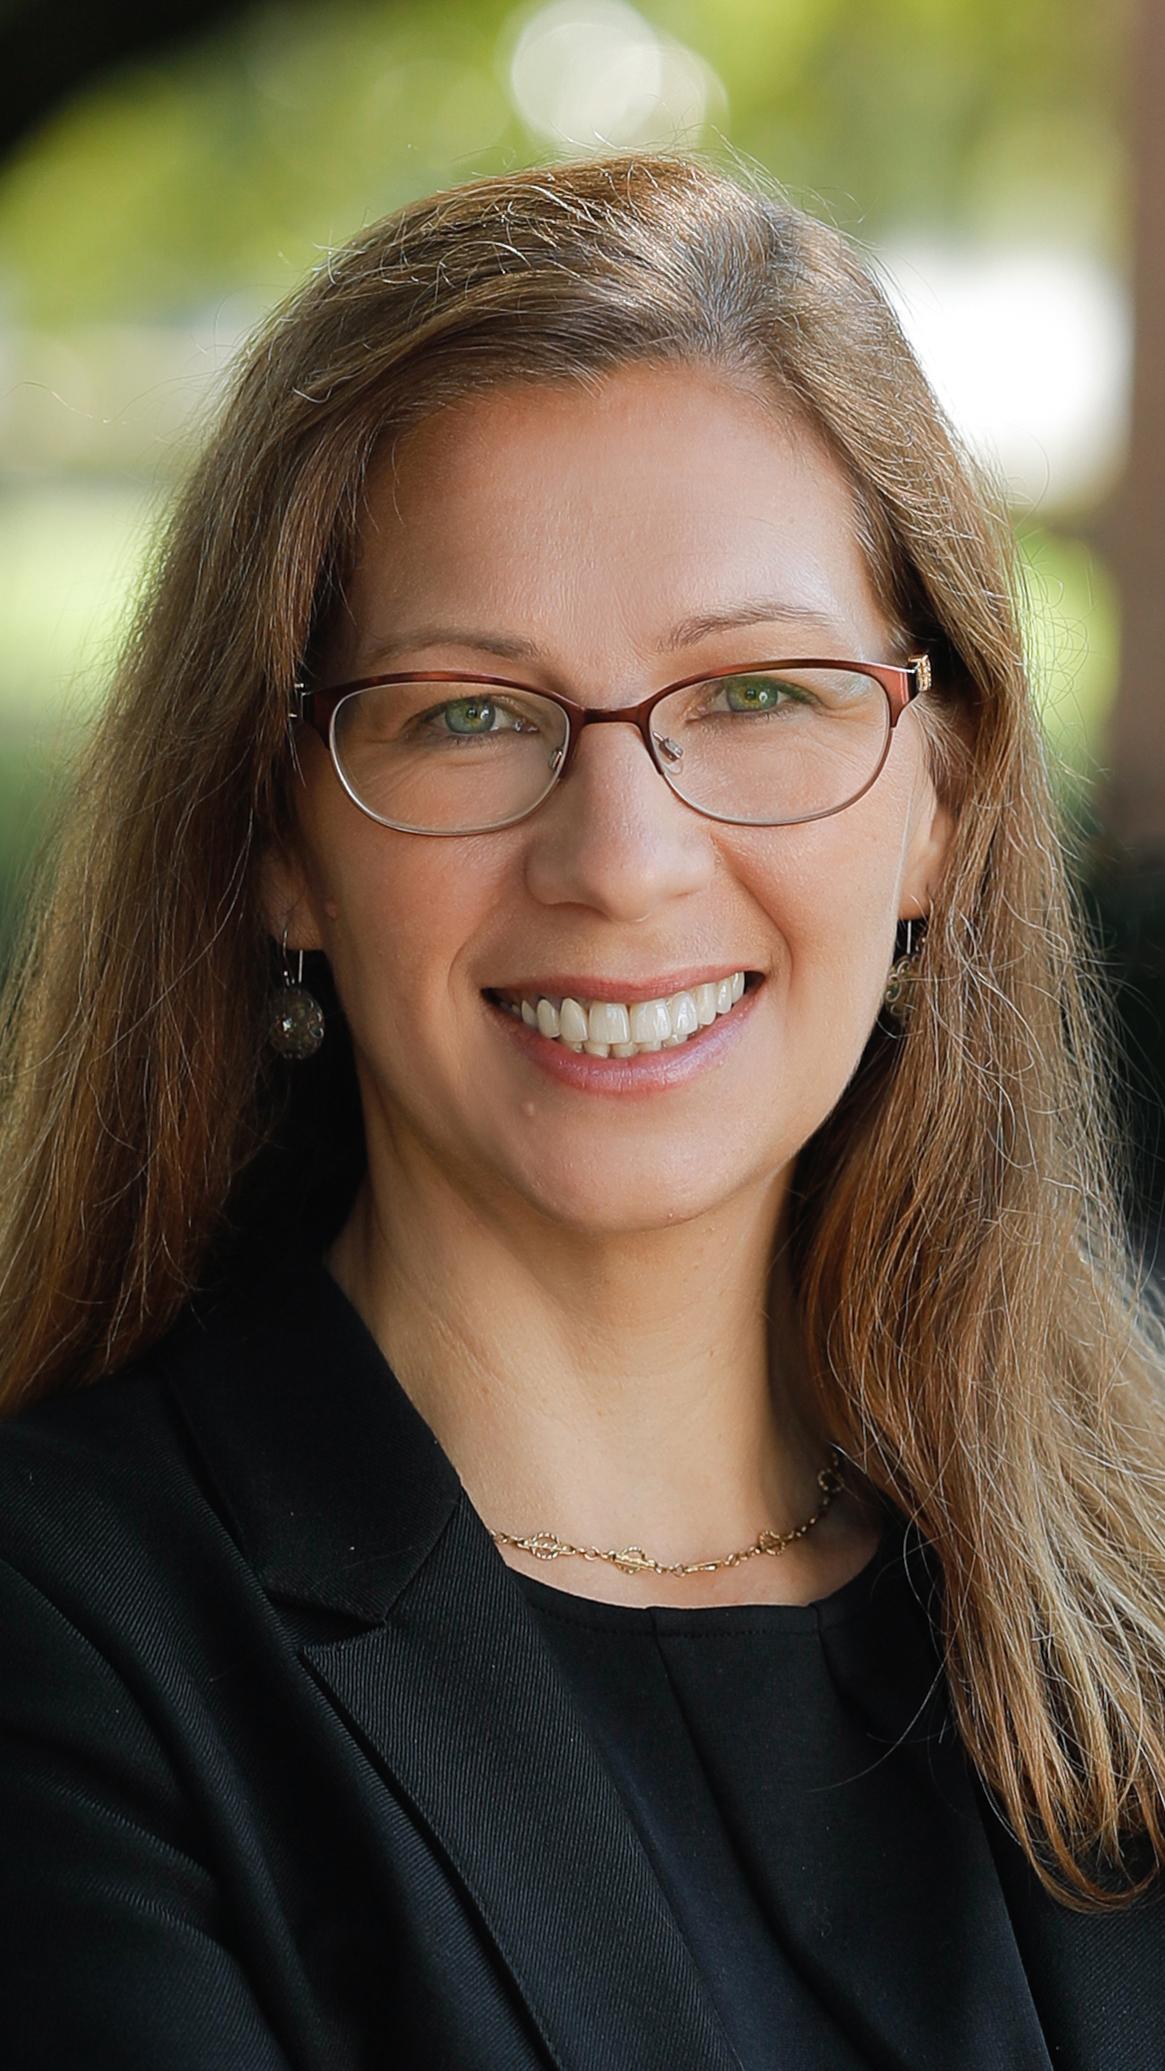 Jenna Silber Storey